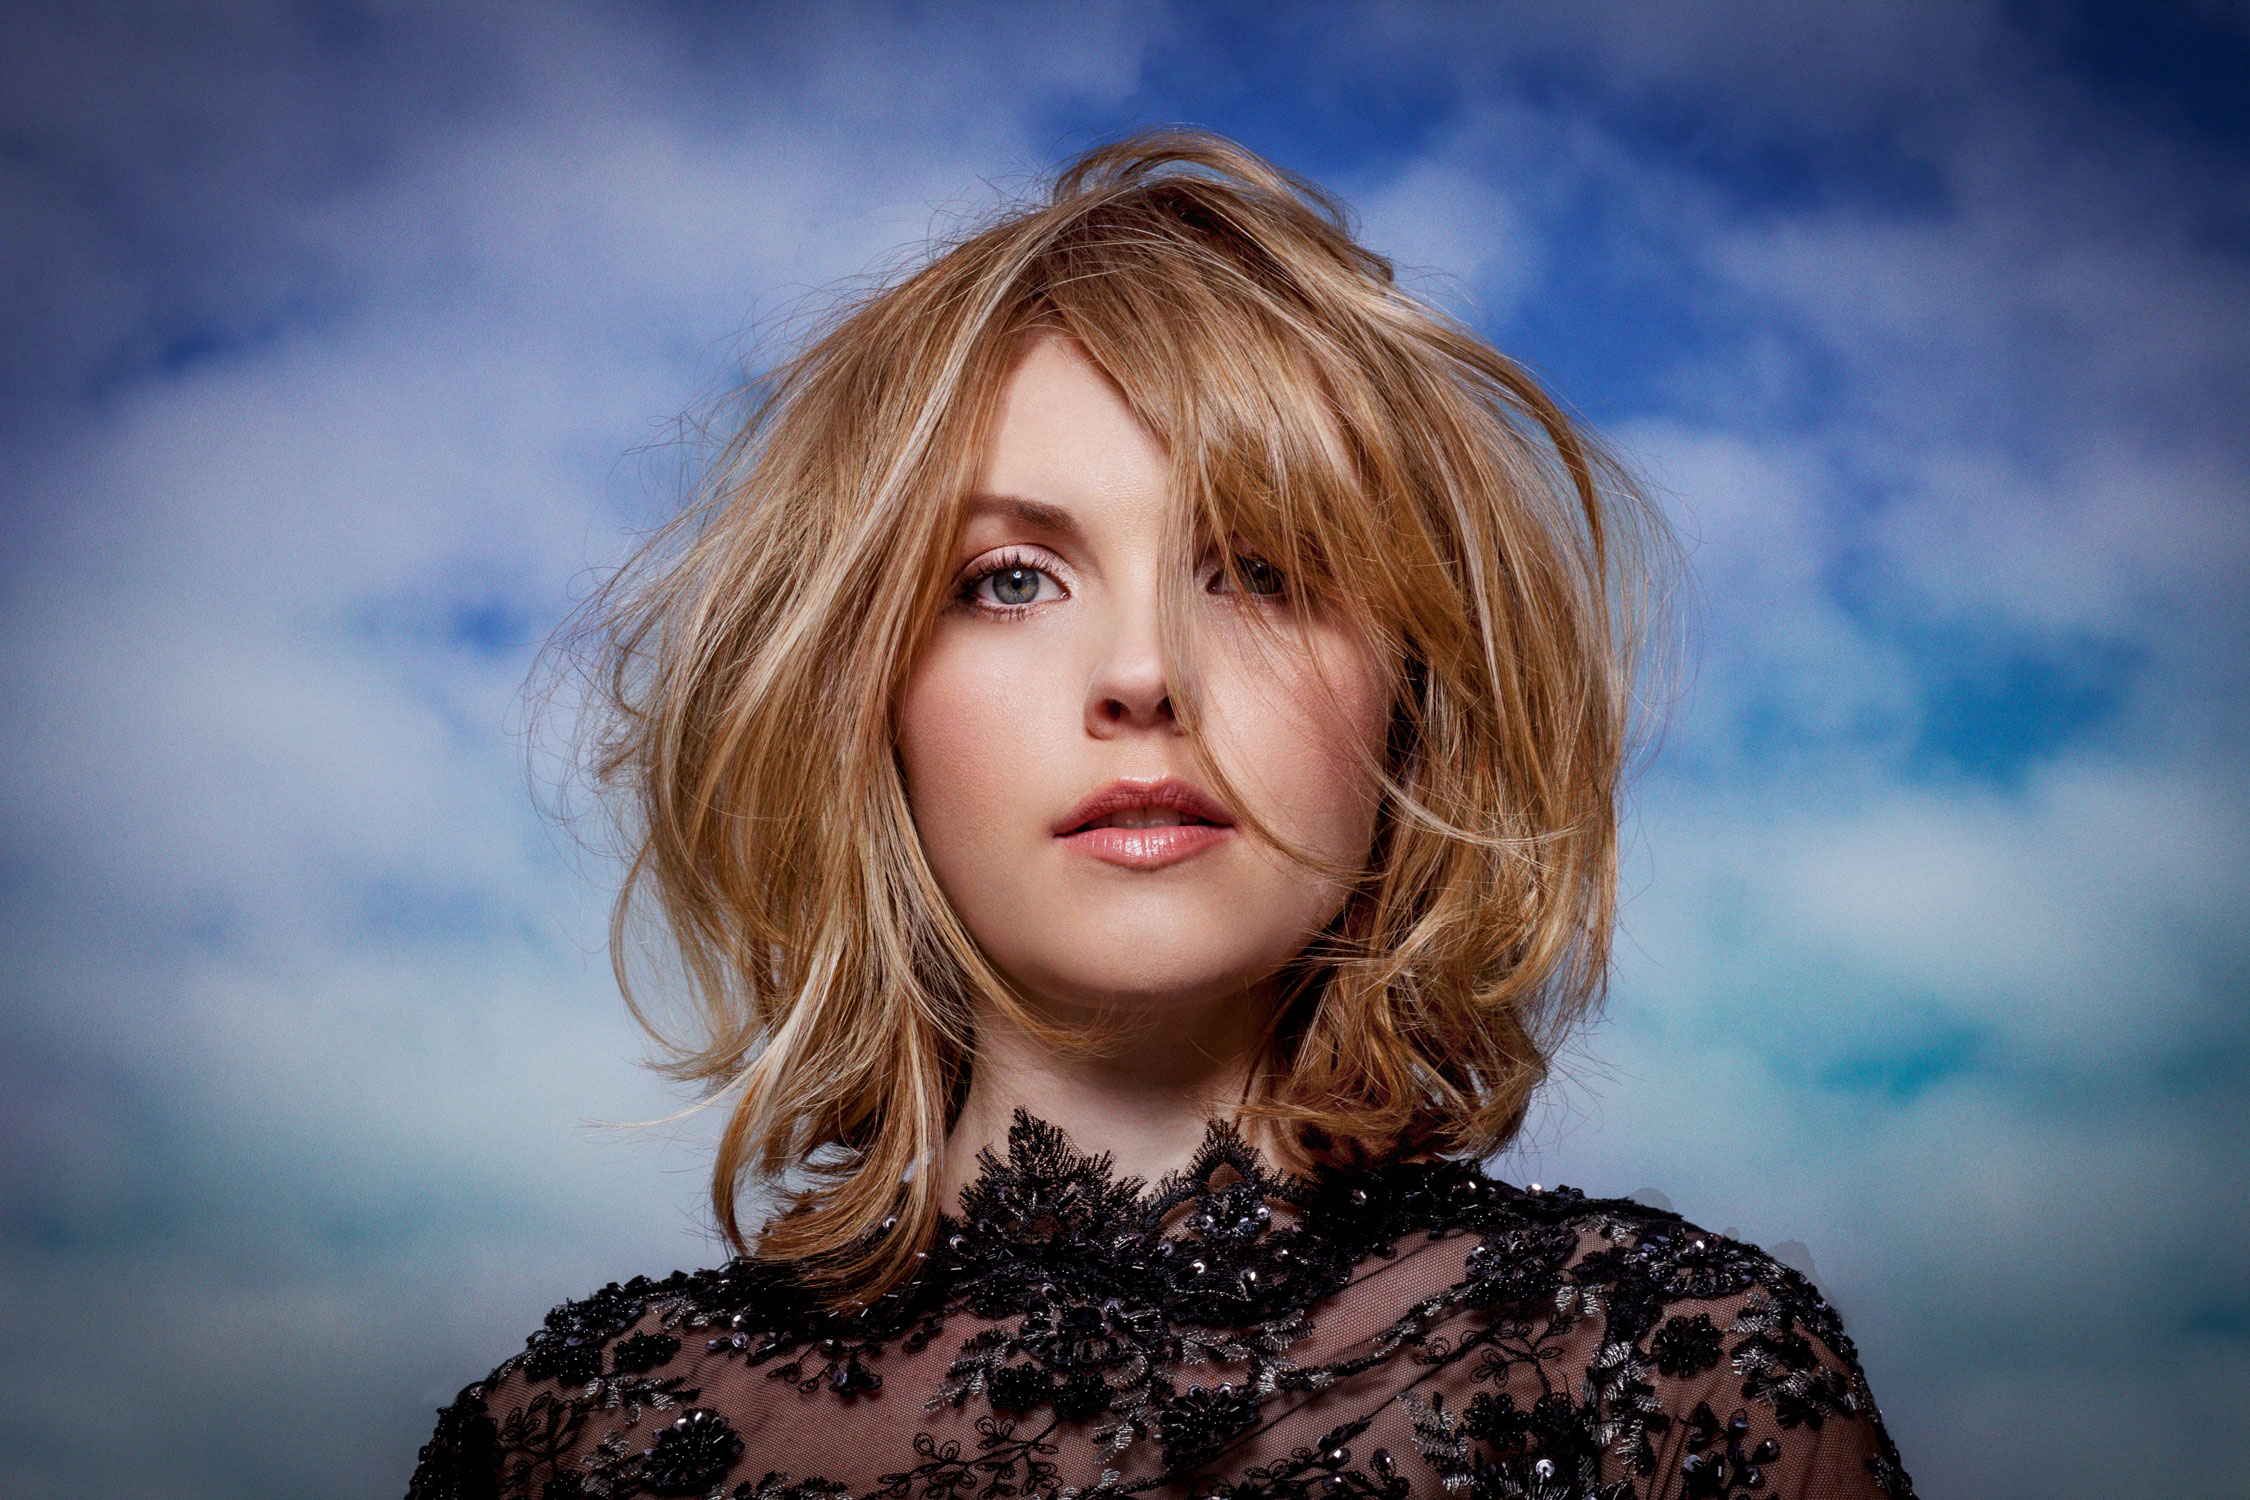 Cassandra_Kubinski-more blonde.jpg